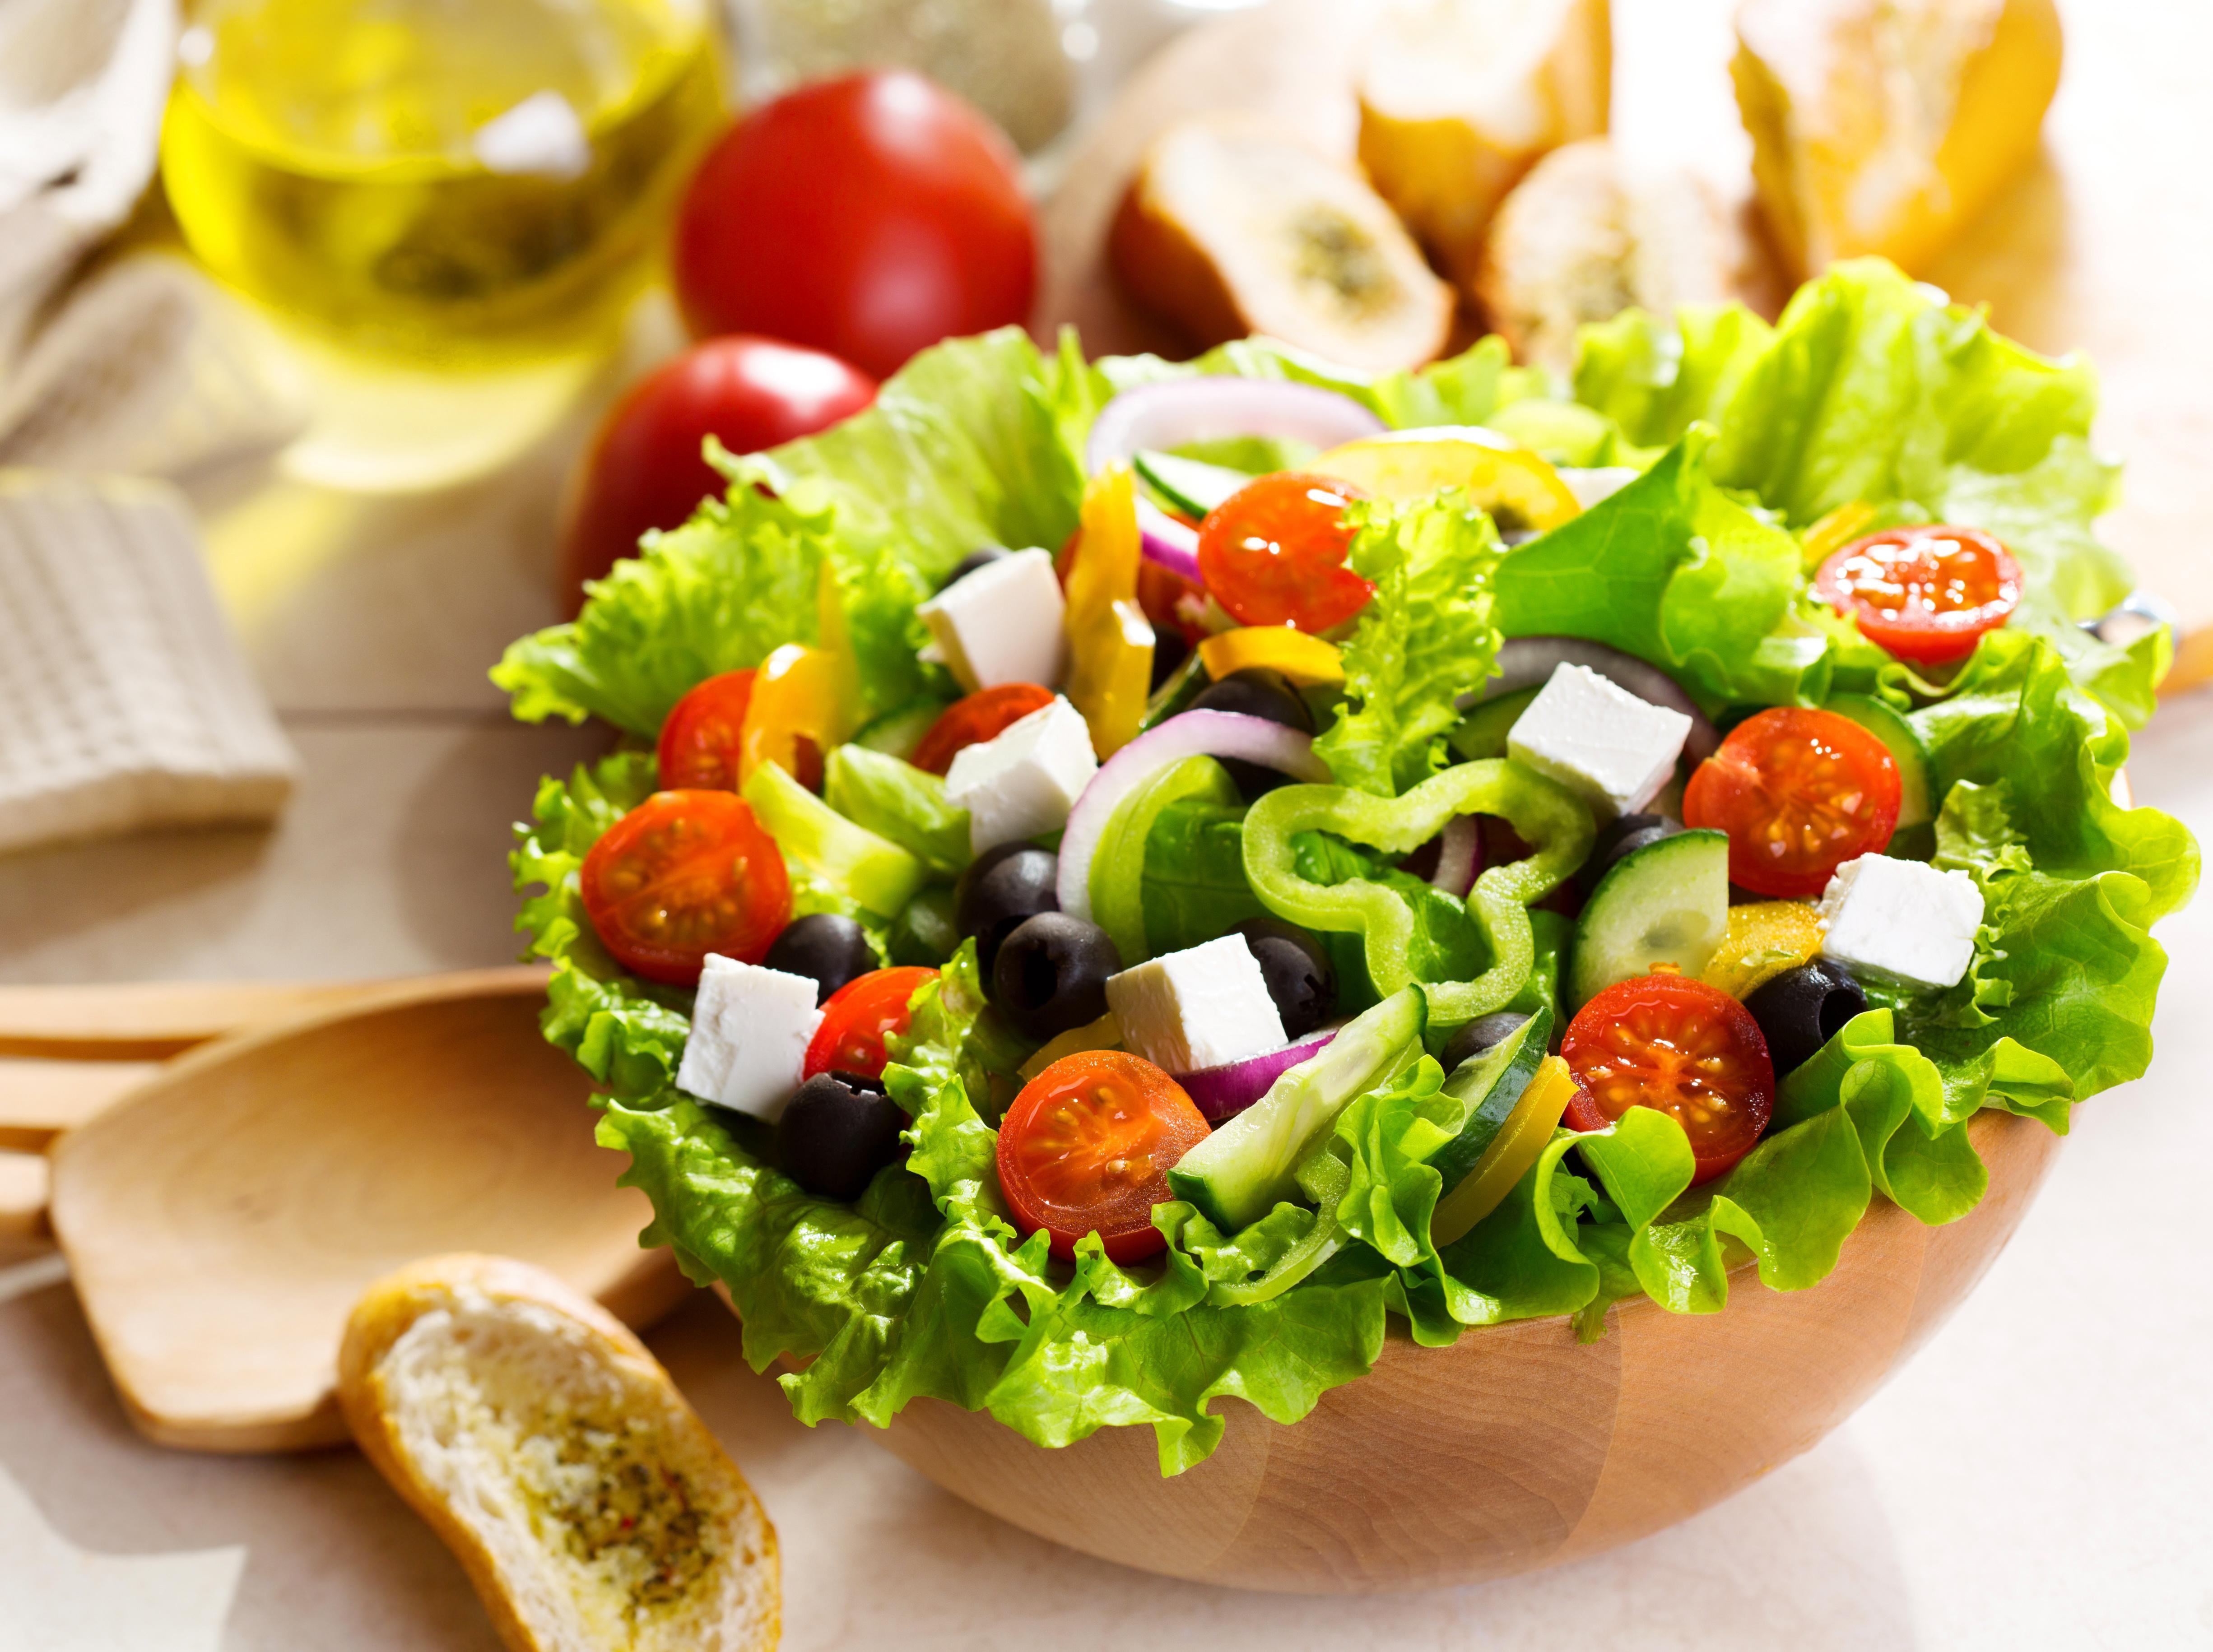 красивые картинки салатами